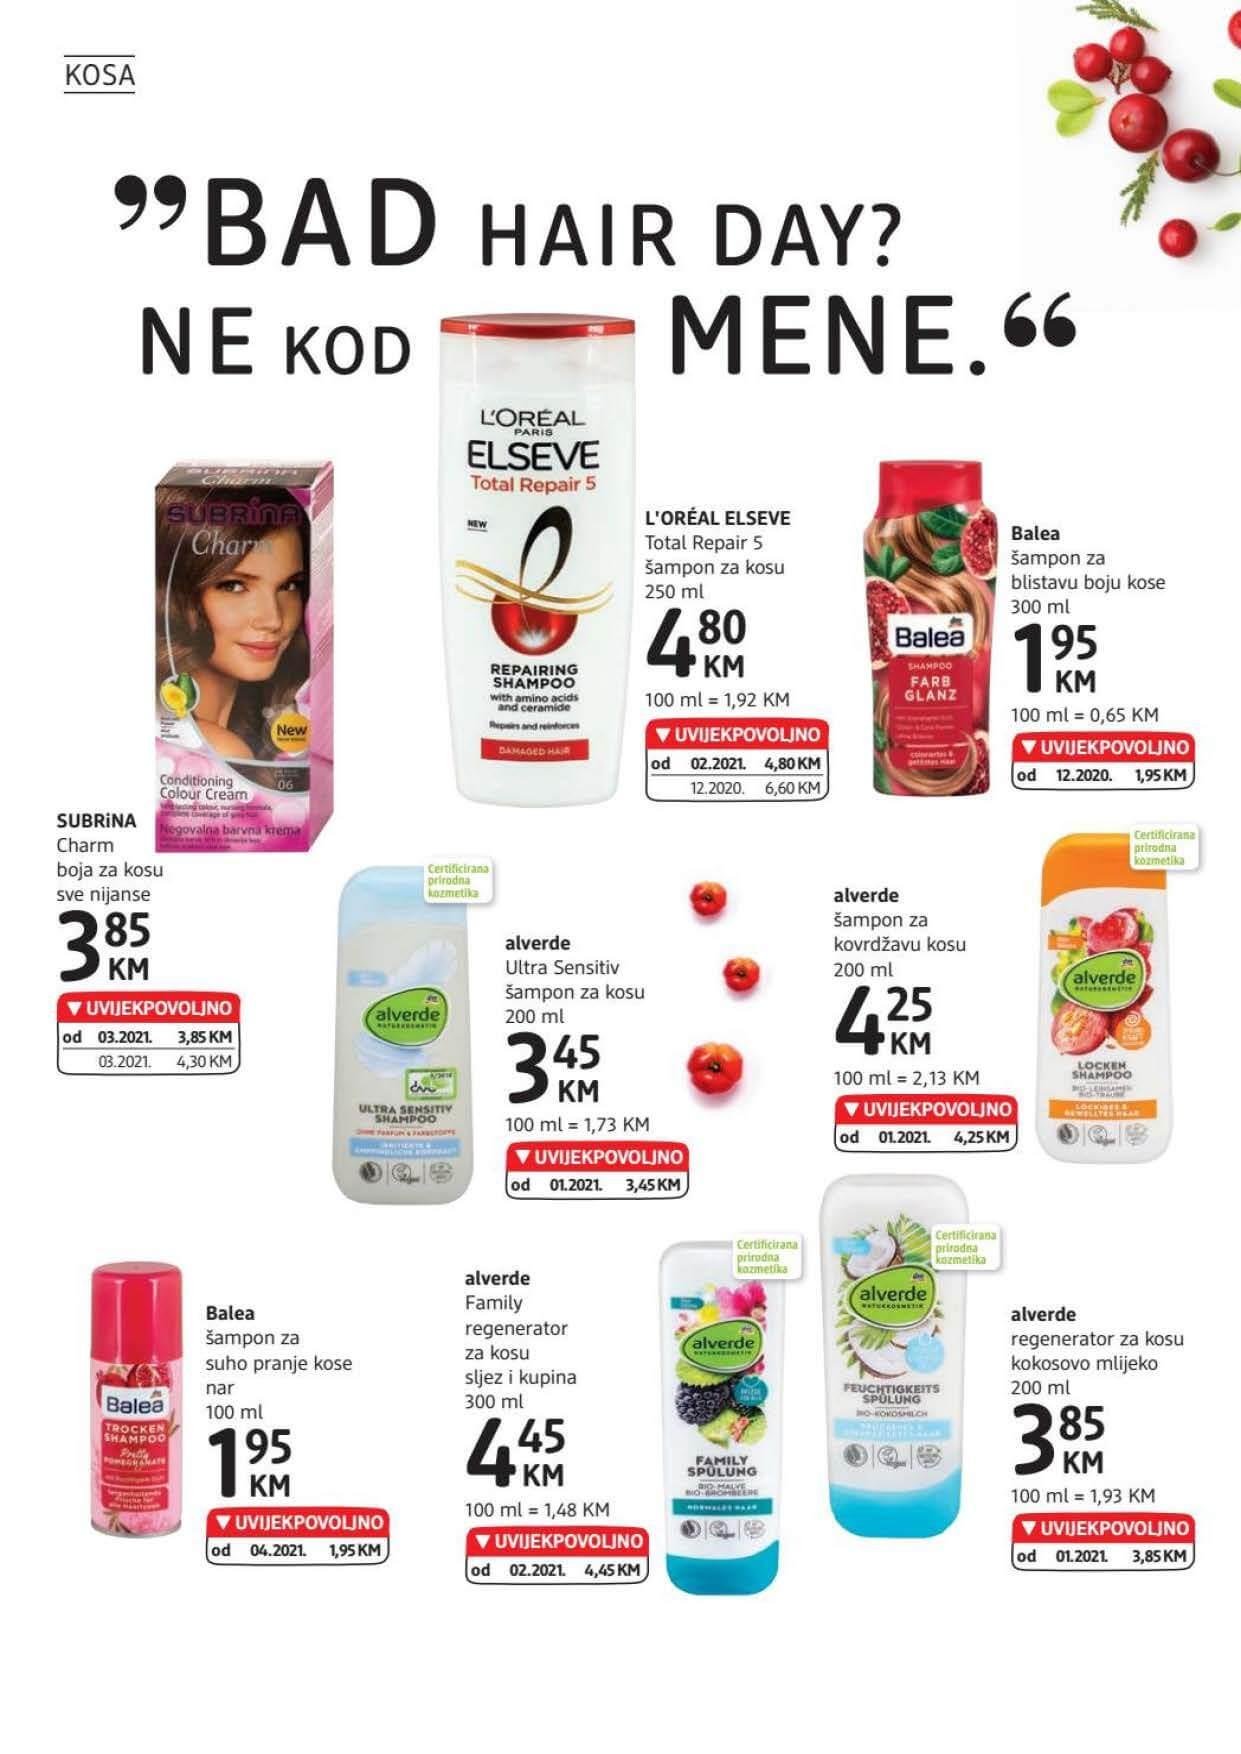 DM Katalog BiH Maj Jun 2021 26.05.2021. 08.06.2021. eKatalozi.com dm Page 14